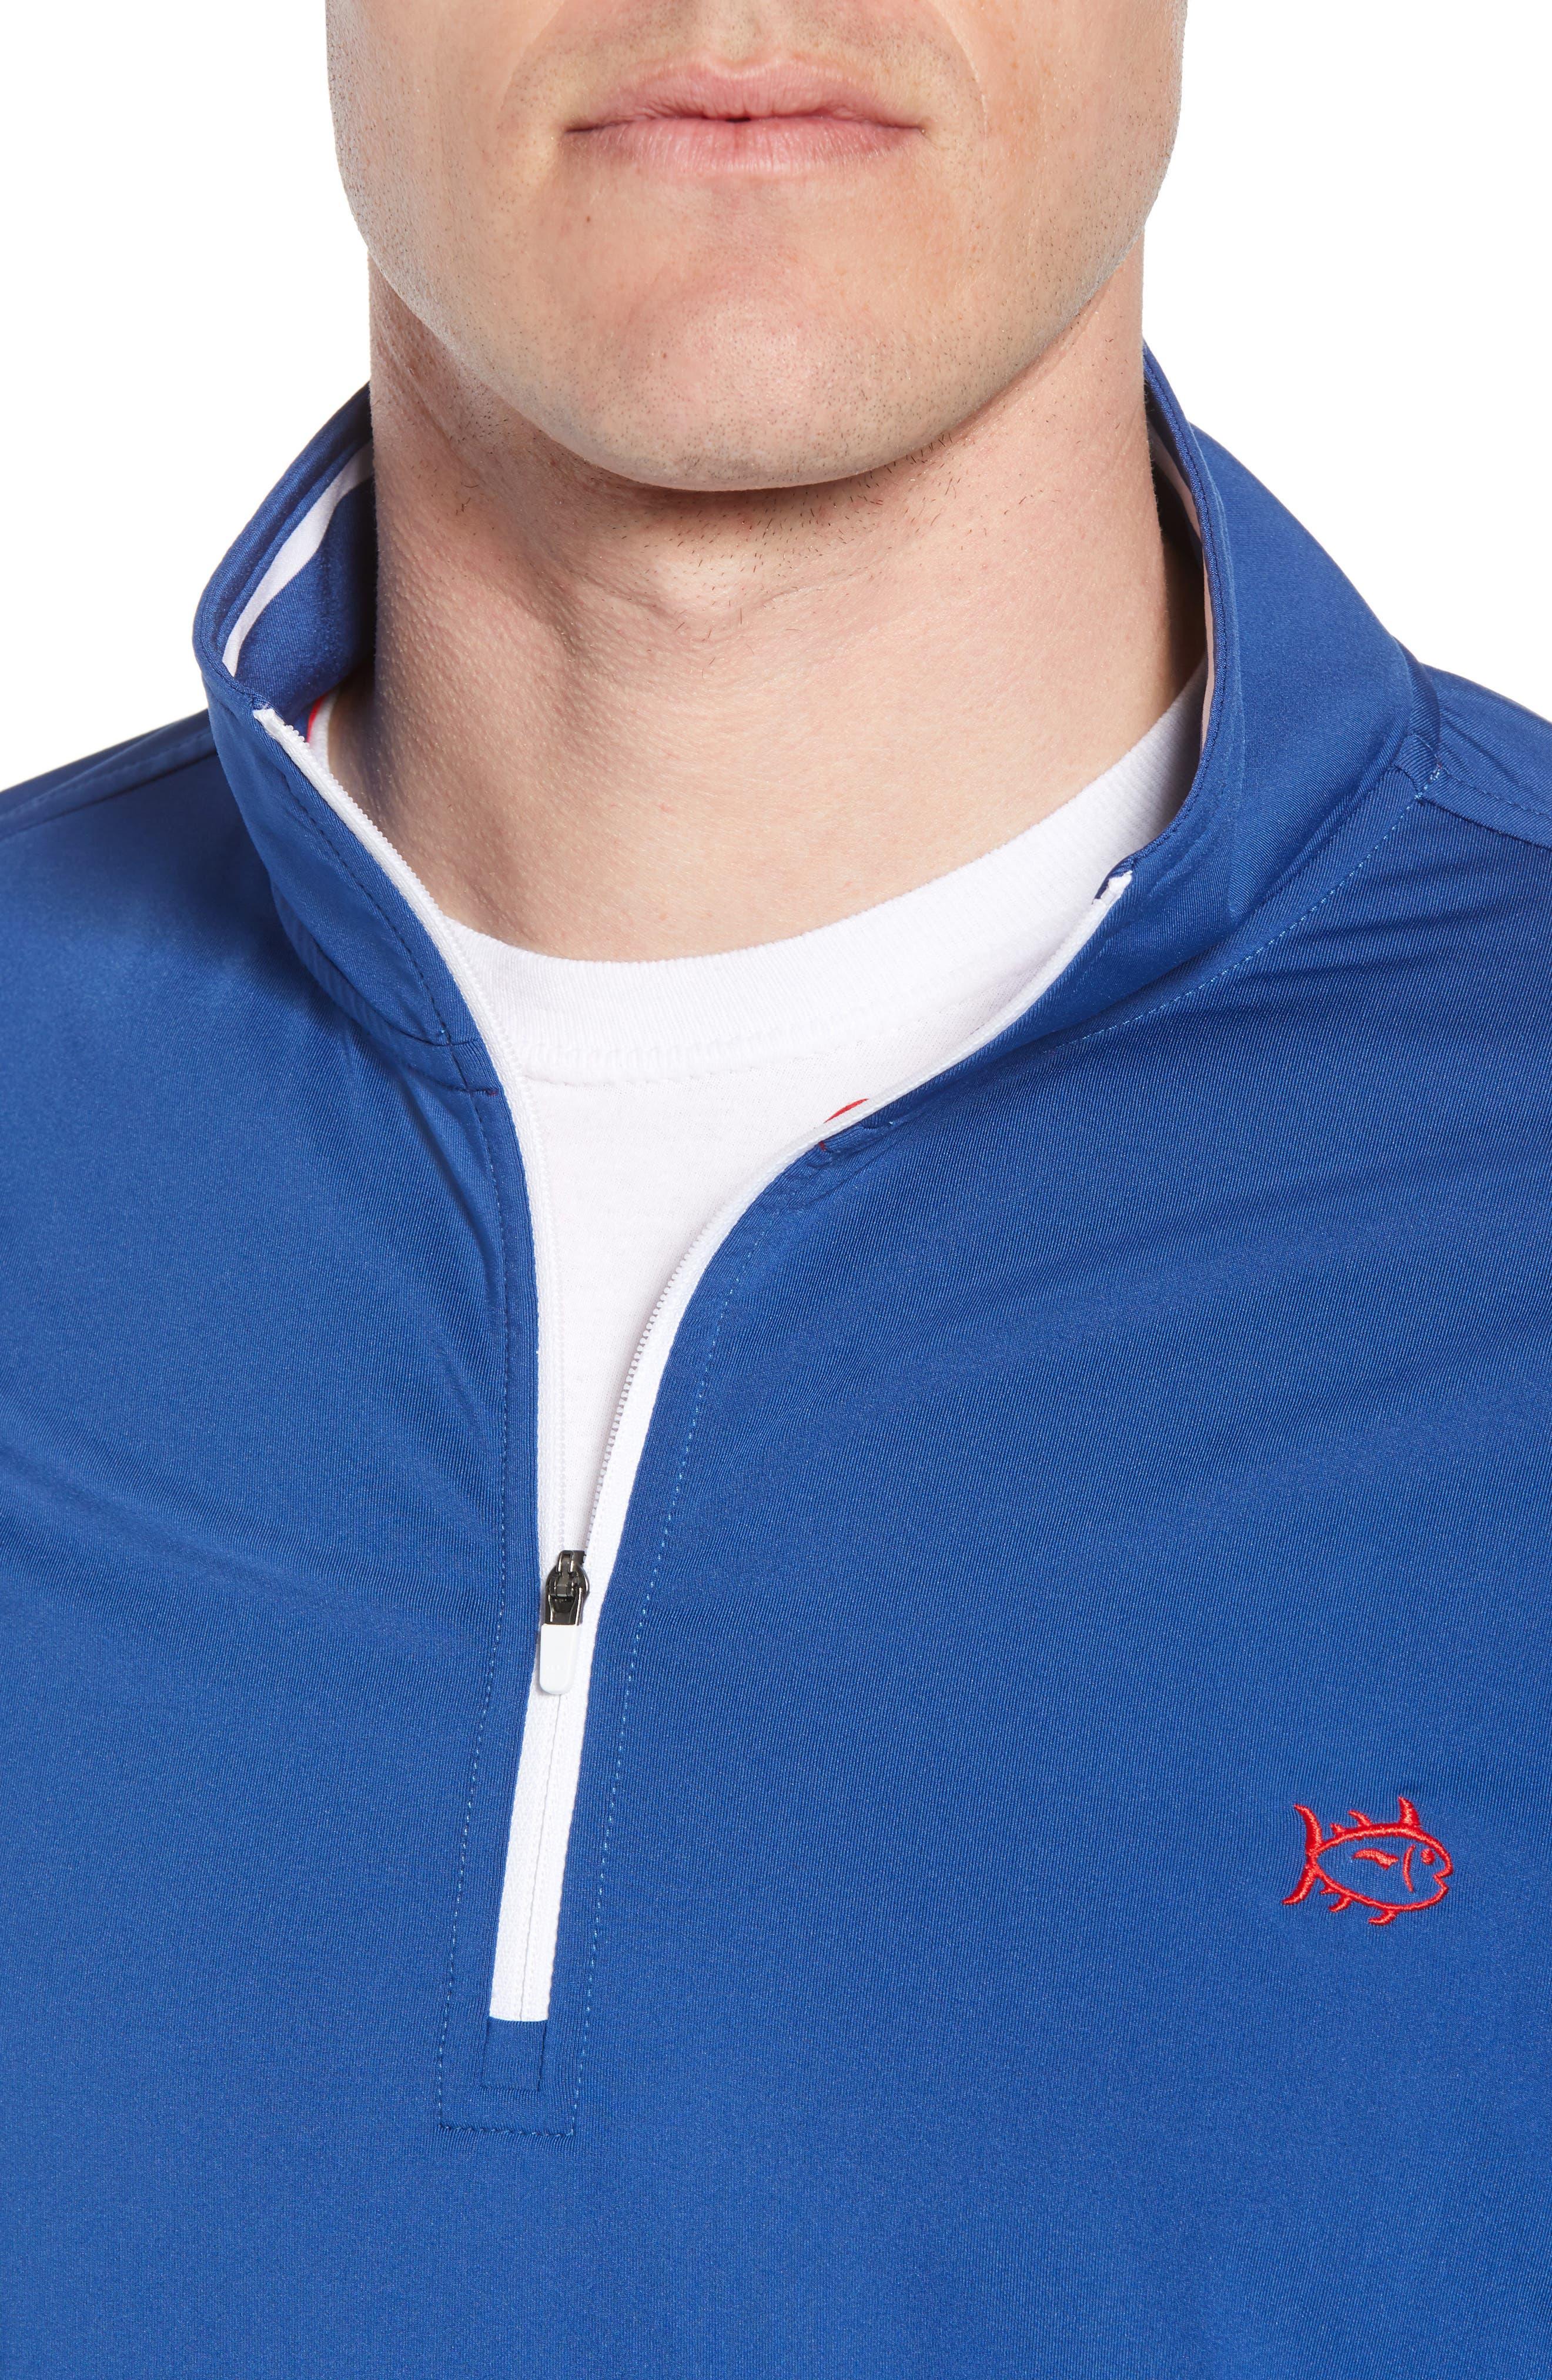 USA Performance Quarter-Zip Pullover,                             Alternate thumbnail 4, color,                             Blue Lake